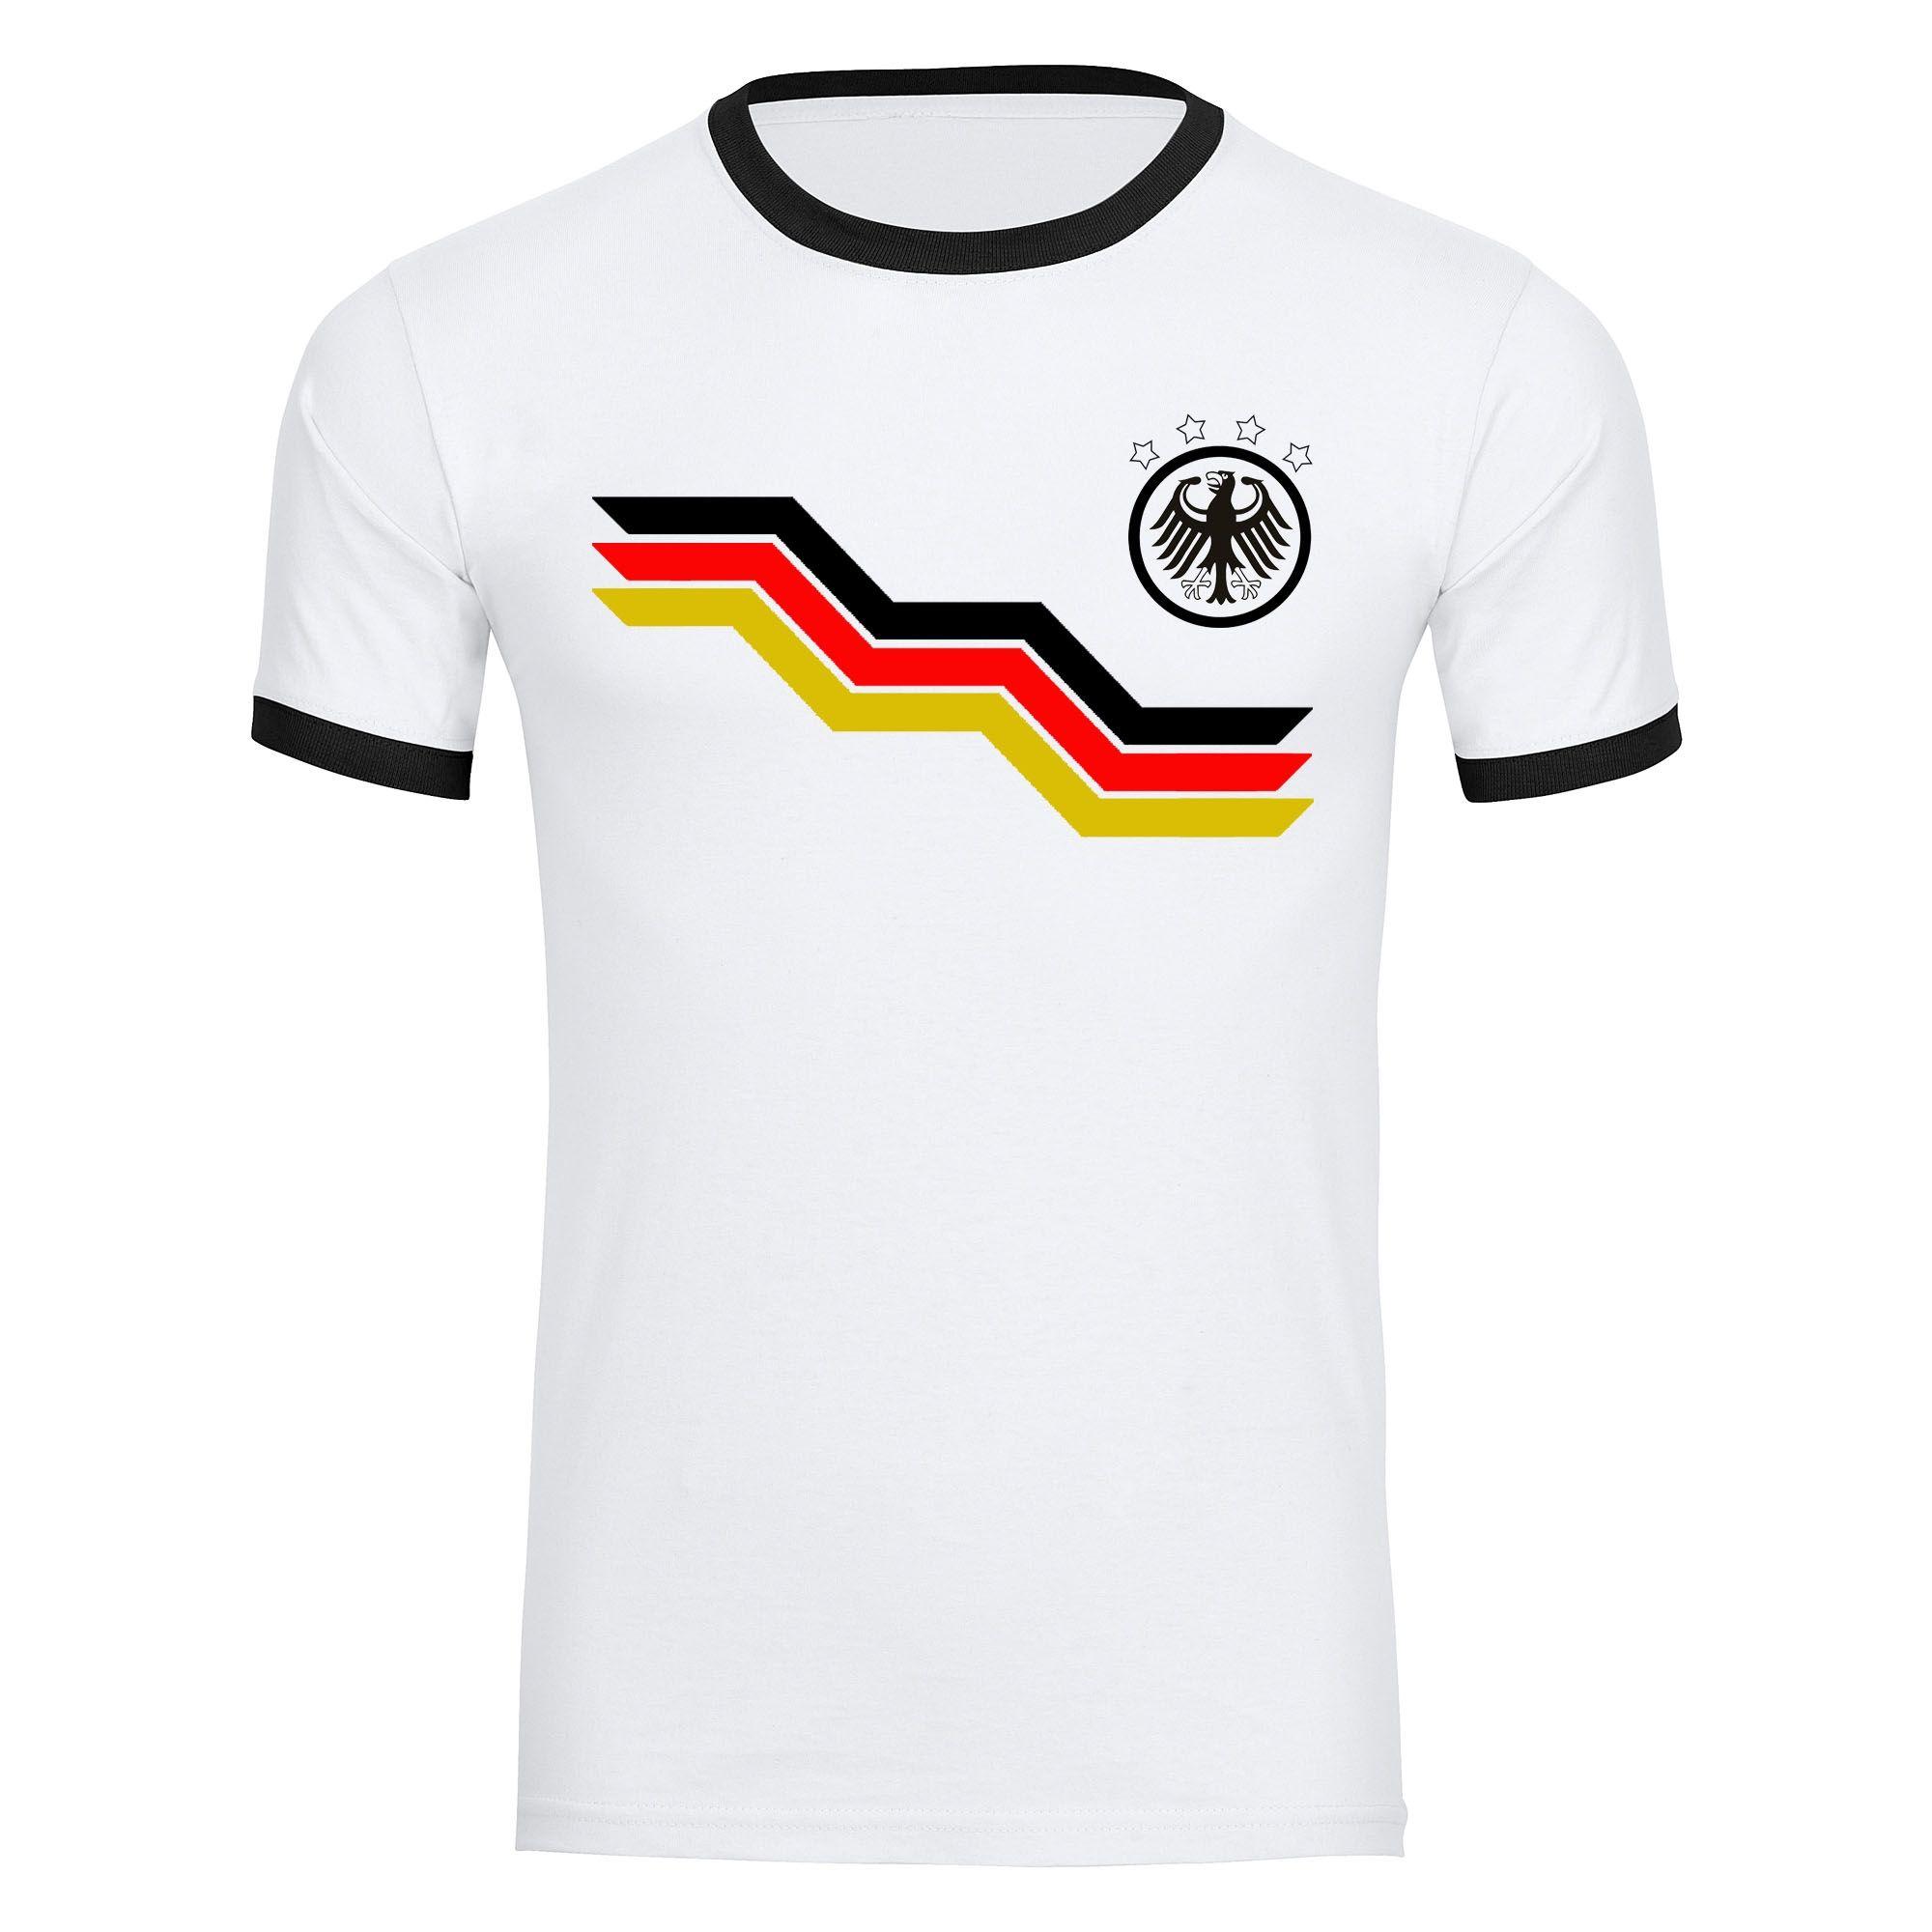 T Shirt Deutschland Adler Trikot Bunte Balkentreppe Herren Weiss Gr S 2xl Deutschland Shirt Weltmeister Russland T Shirt Deutschland Shirts Trikot